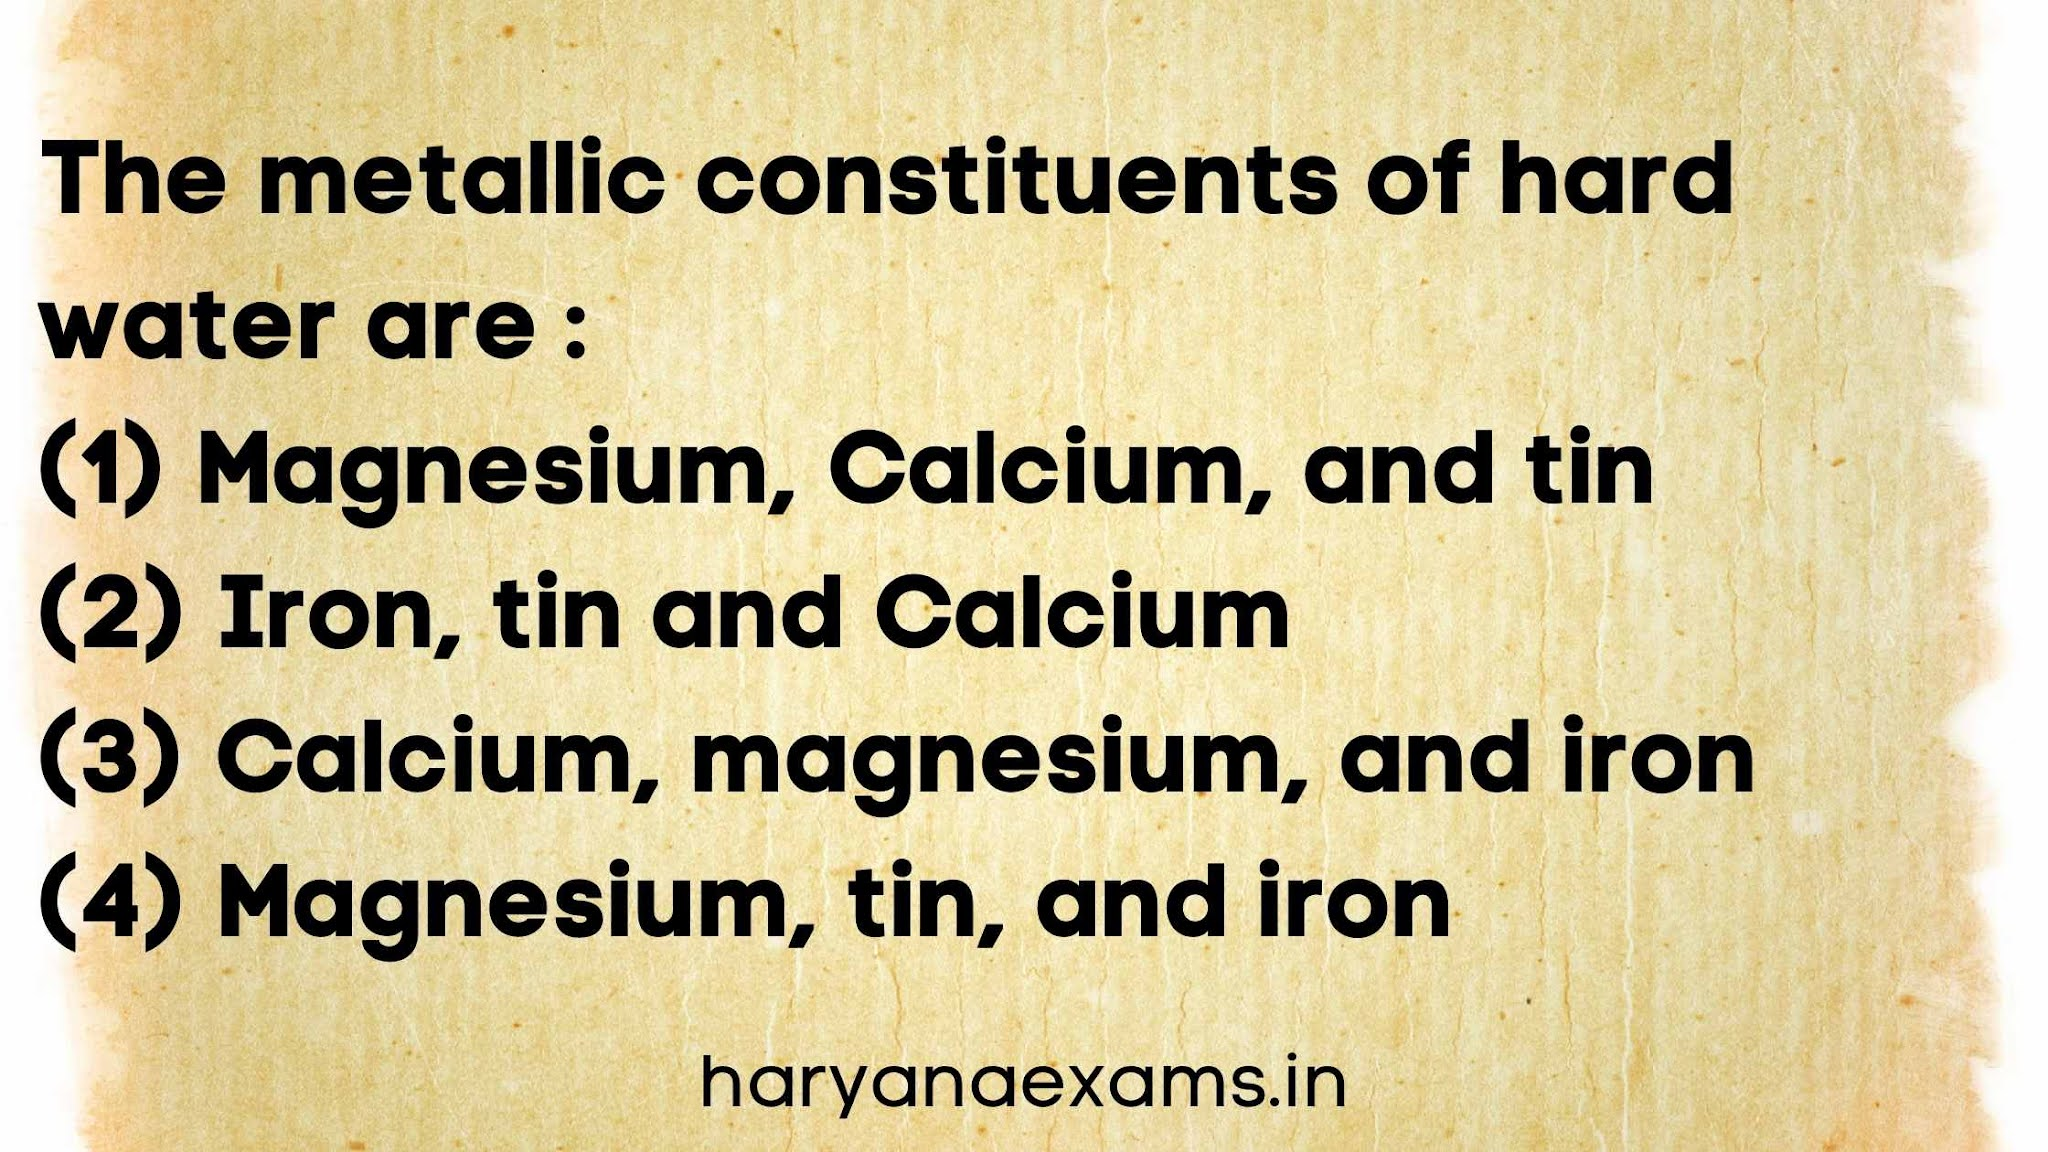 The metallic constituents of hard water are :   (1) Magnesium, Calcium, and tin   (2) Iron, tin and Calcium   (3) Calcium, magnesium, and iron   (4) Magnesium, tin, and iron